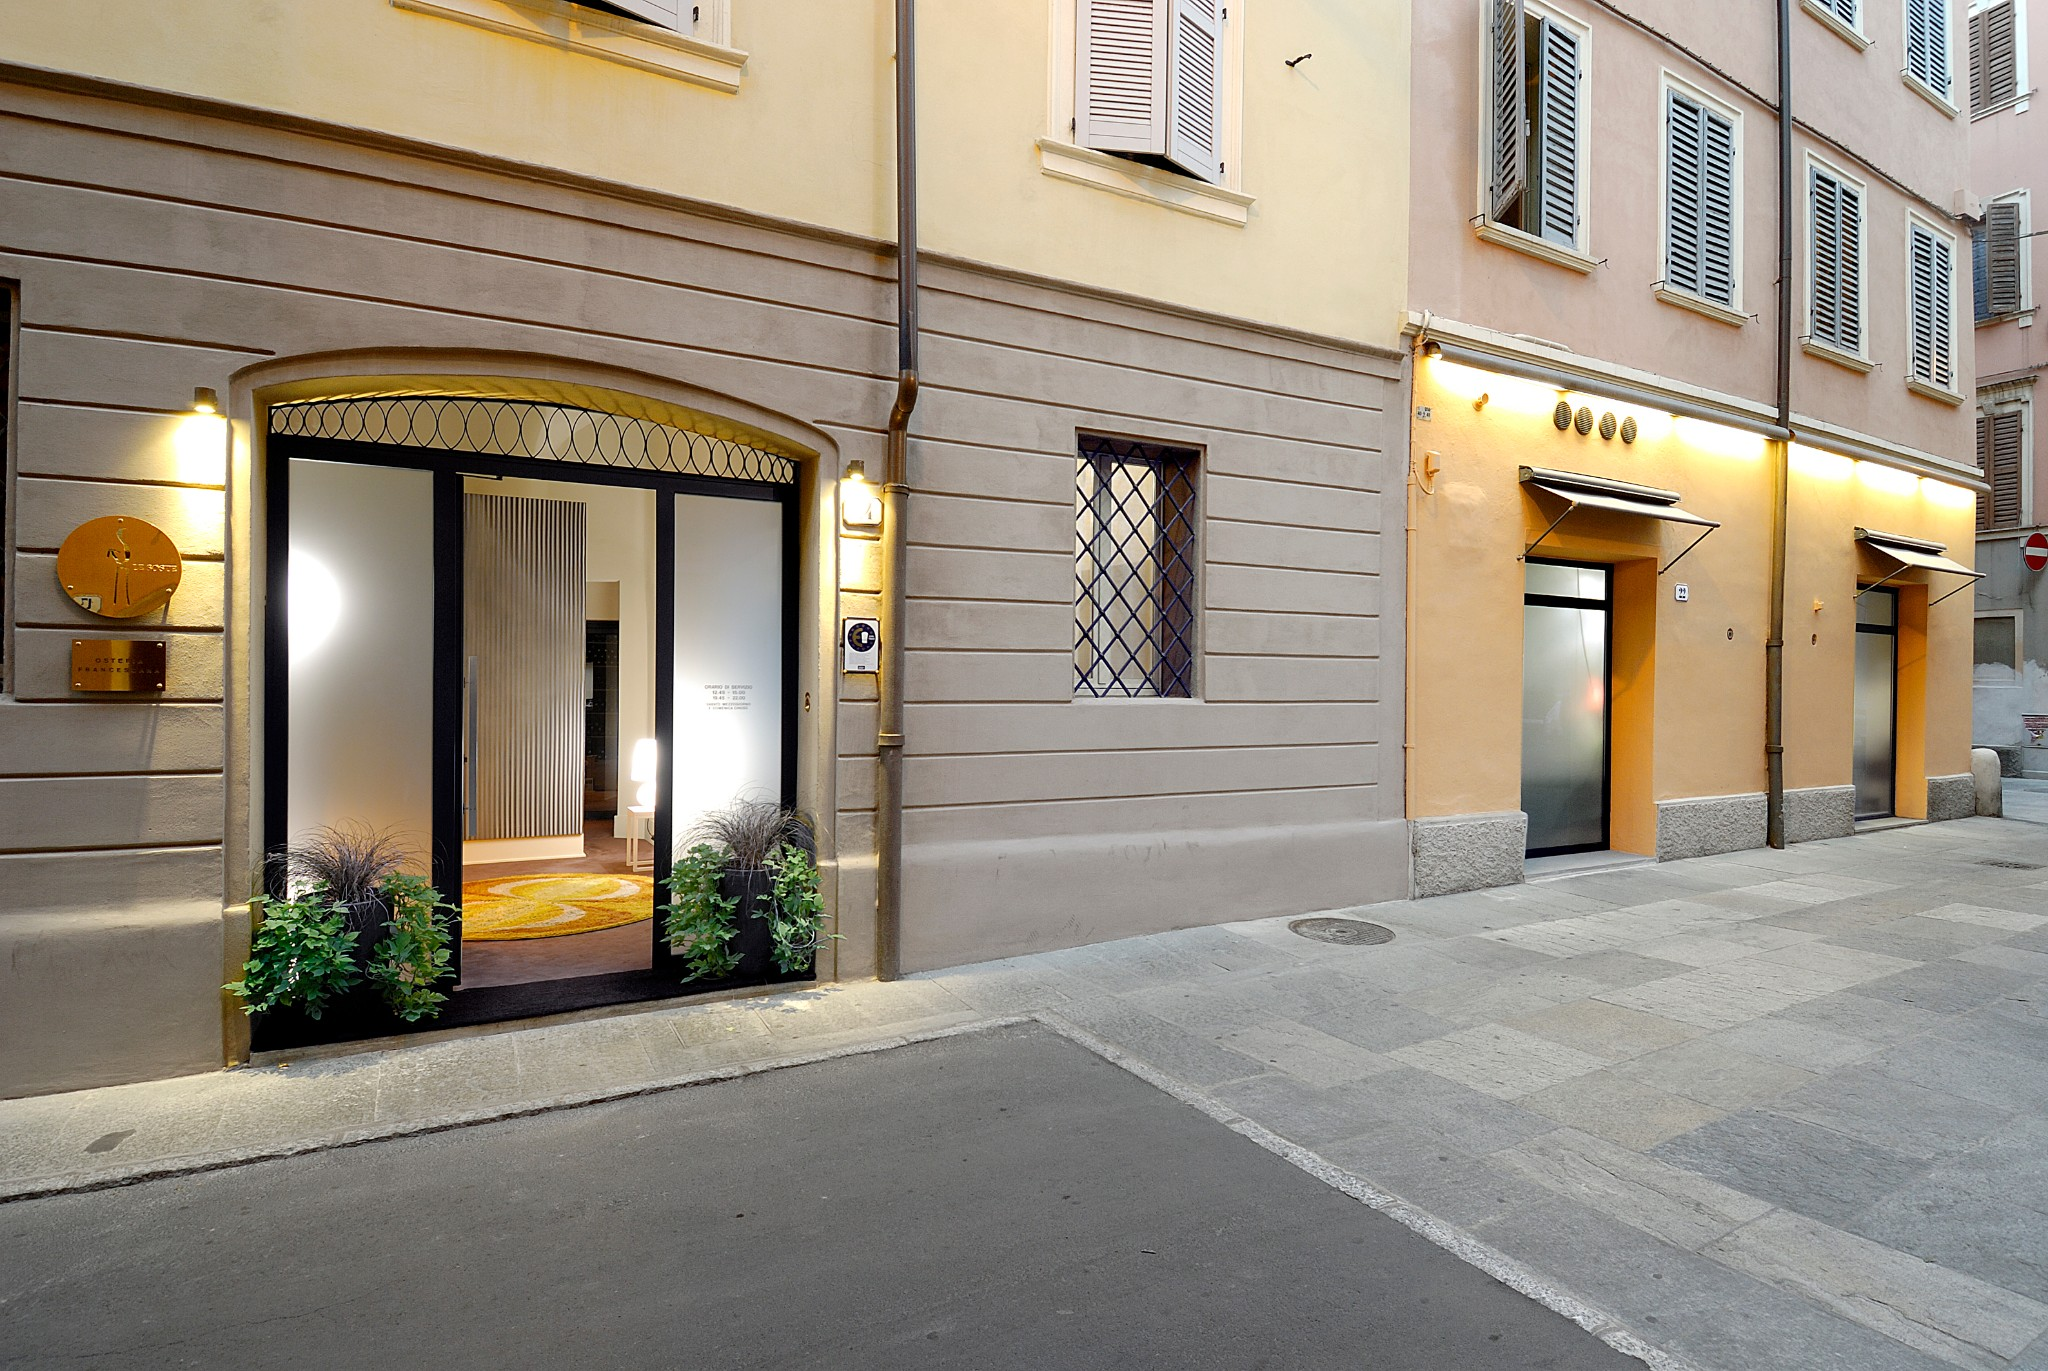 Osteria Francescana Exterior 3. Photo Credit